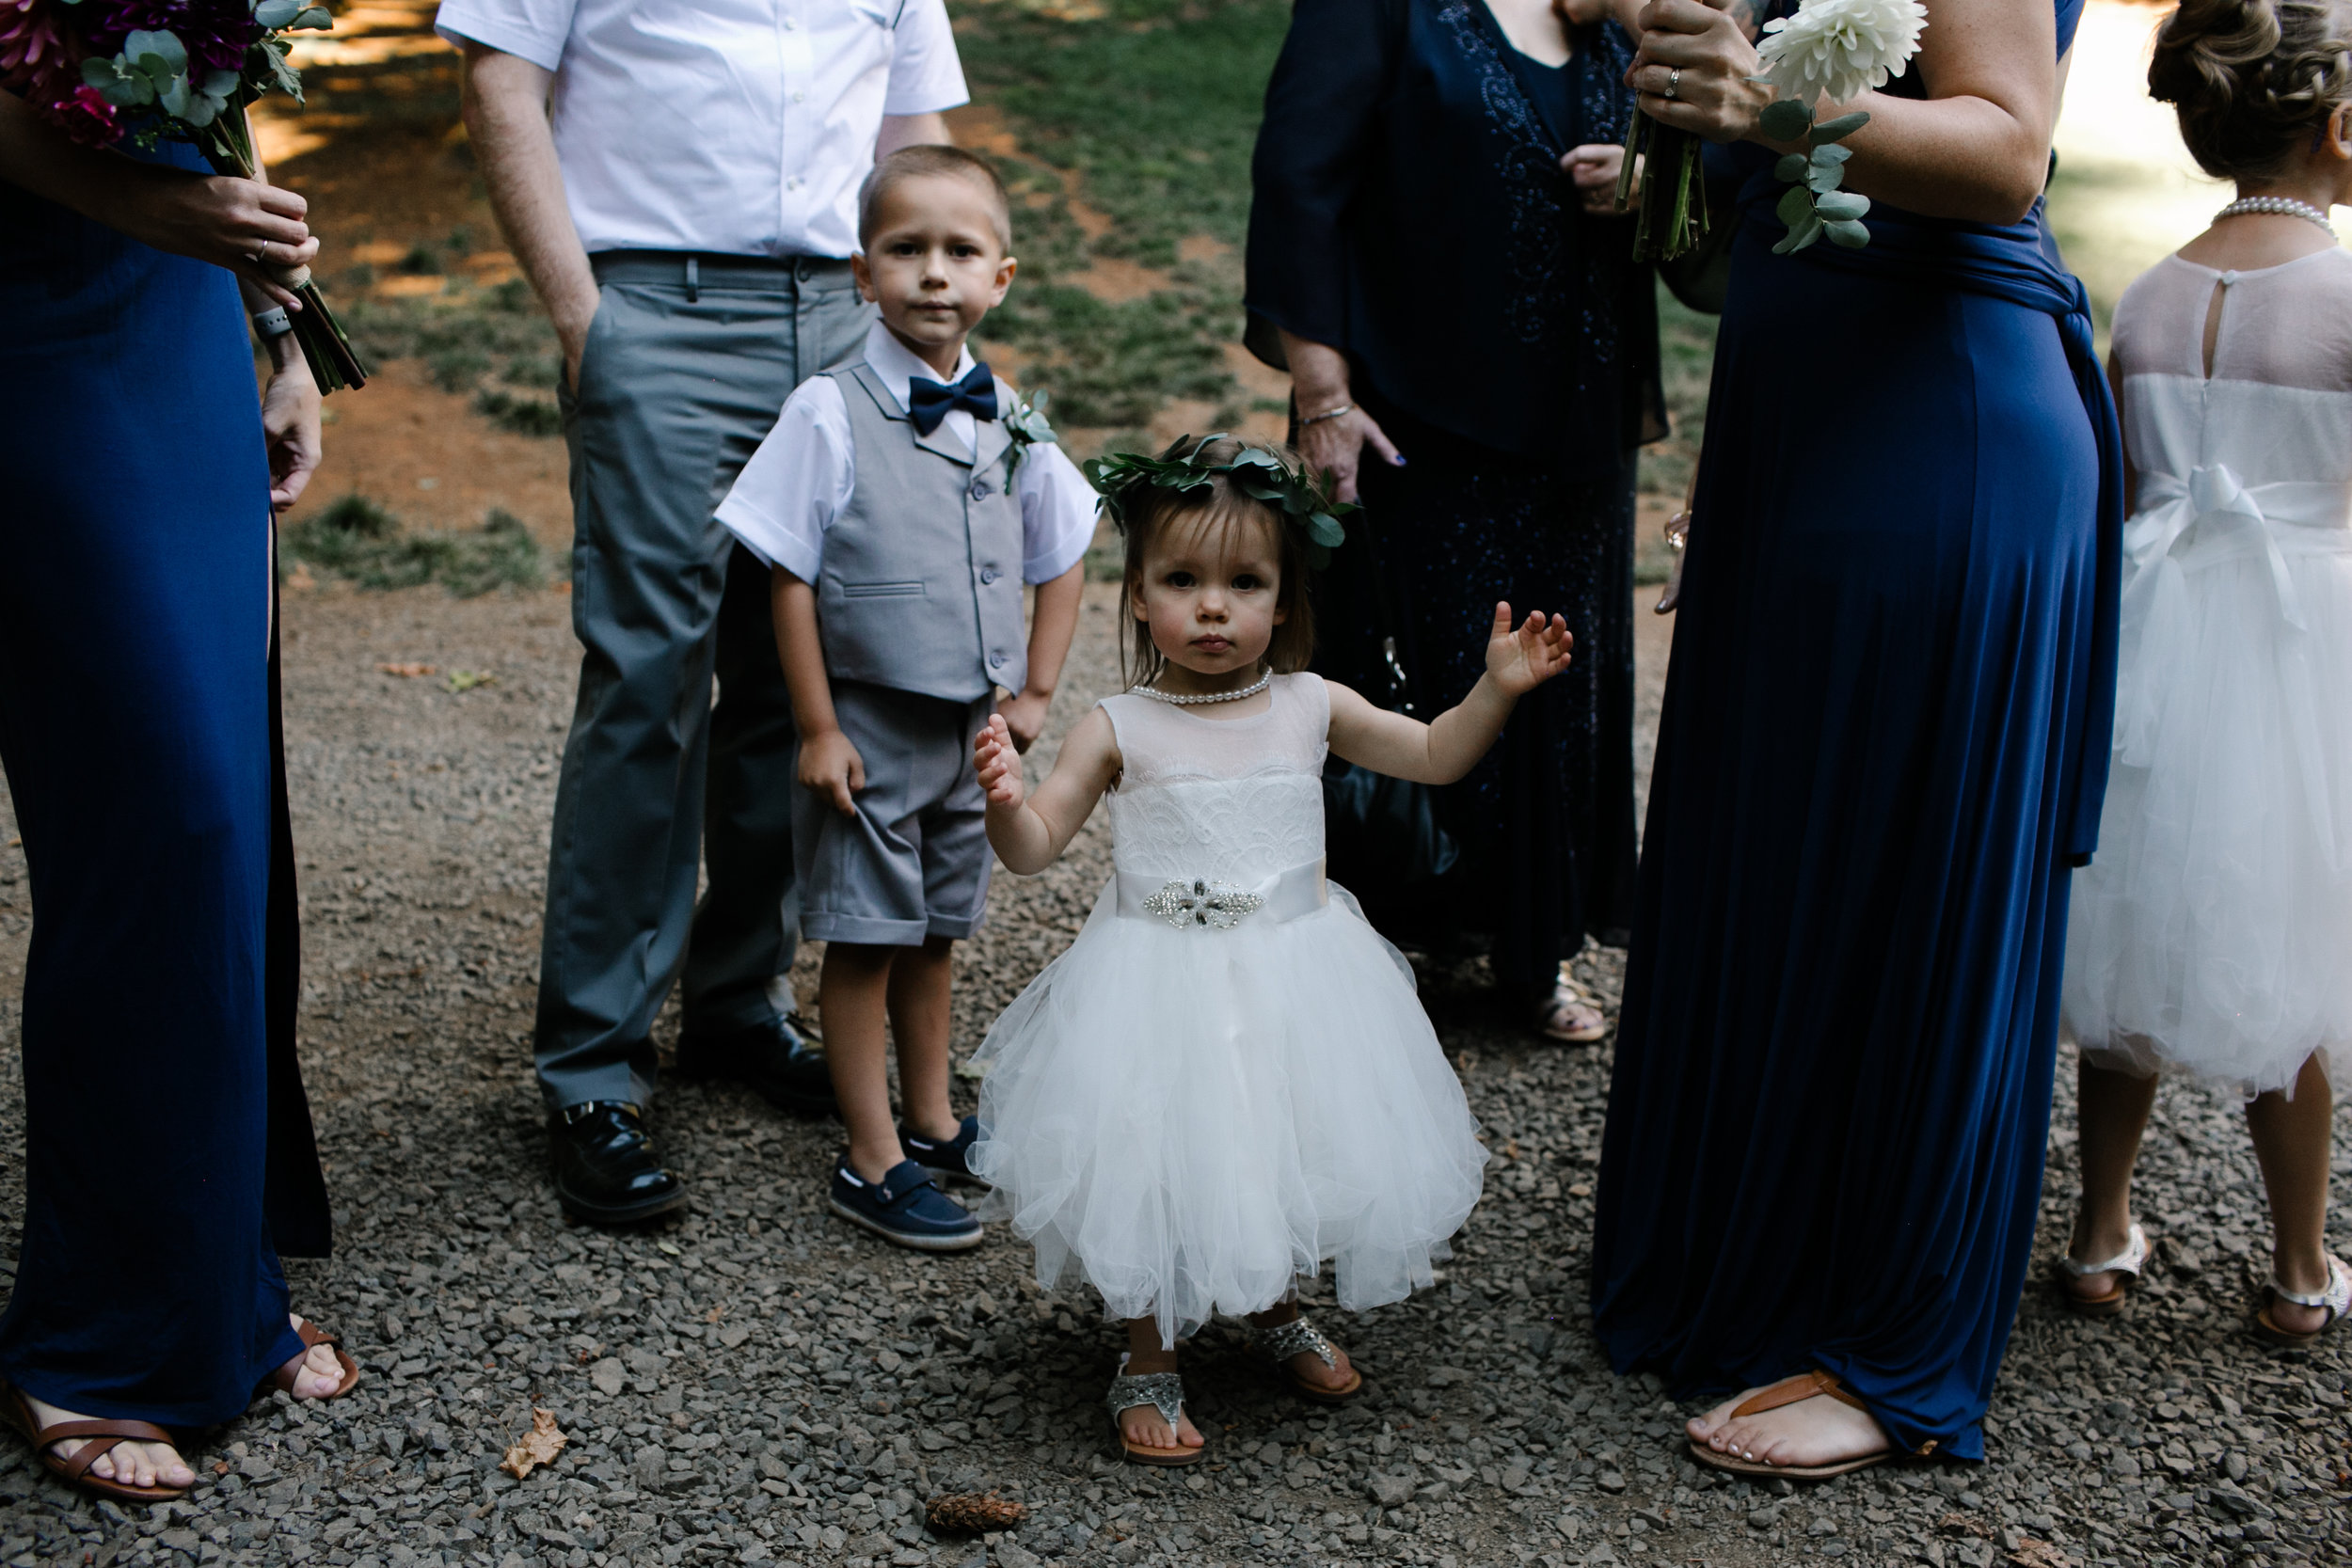 Sevlynn-Photography-Teresa-Chandler-Wedding-29.jpg